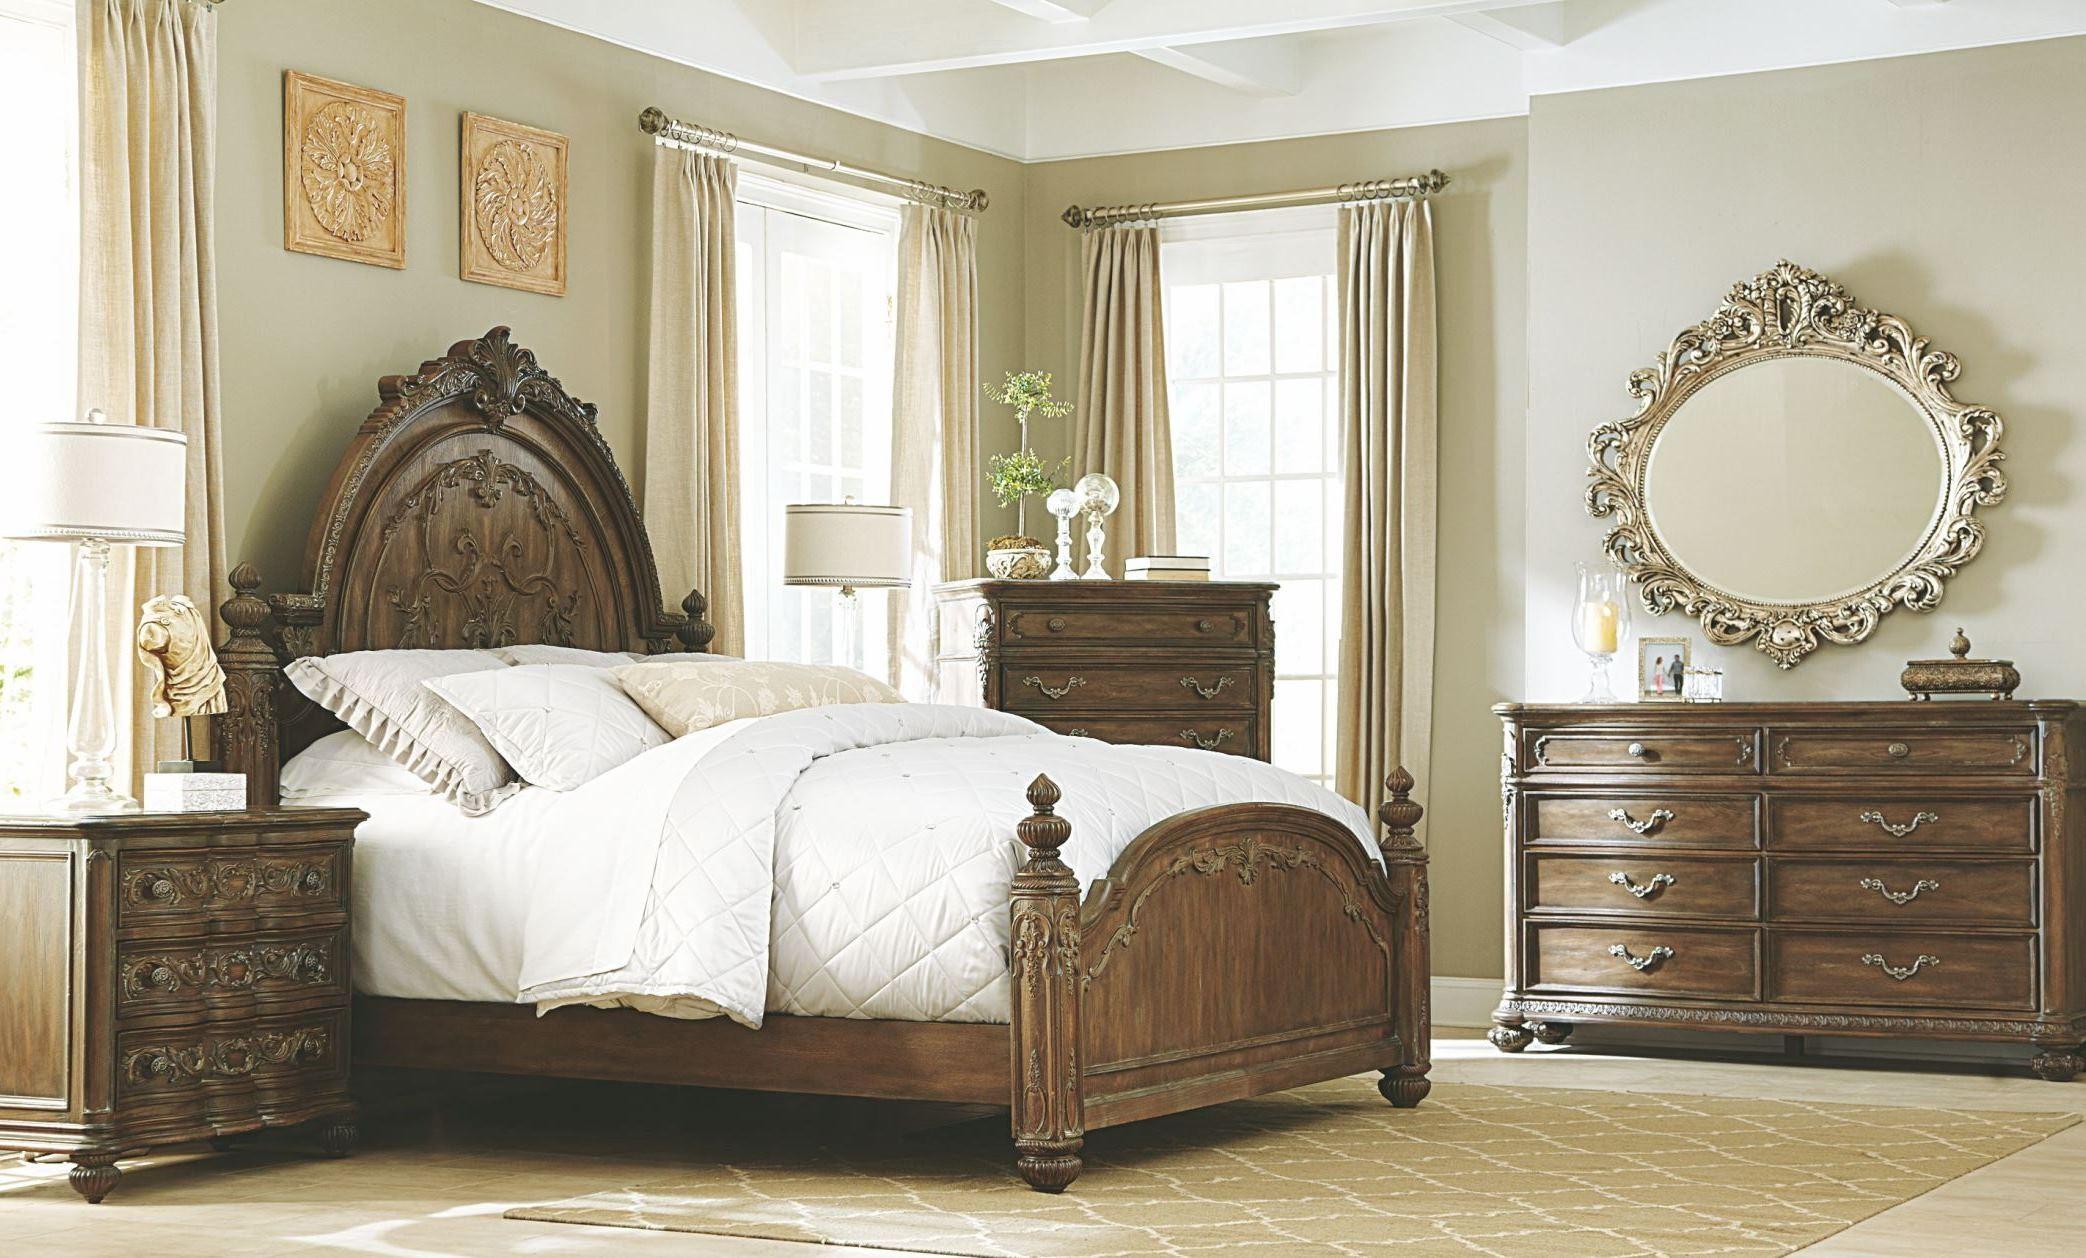 Jessica mcclintock boutique baroque mansion bedroom set for Baroque bedroom furniture